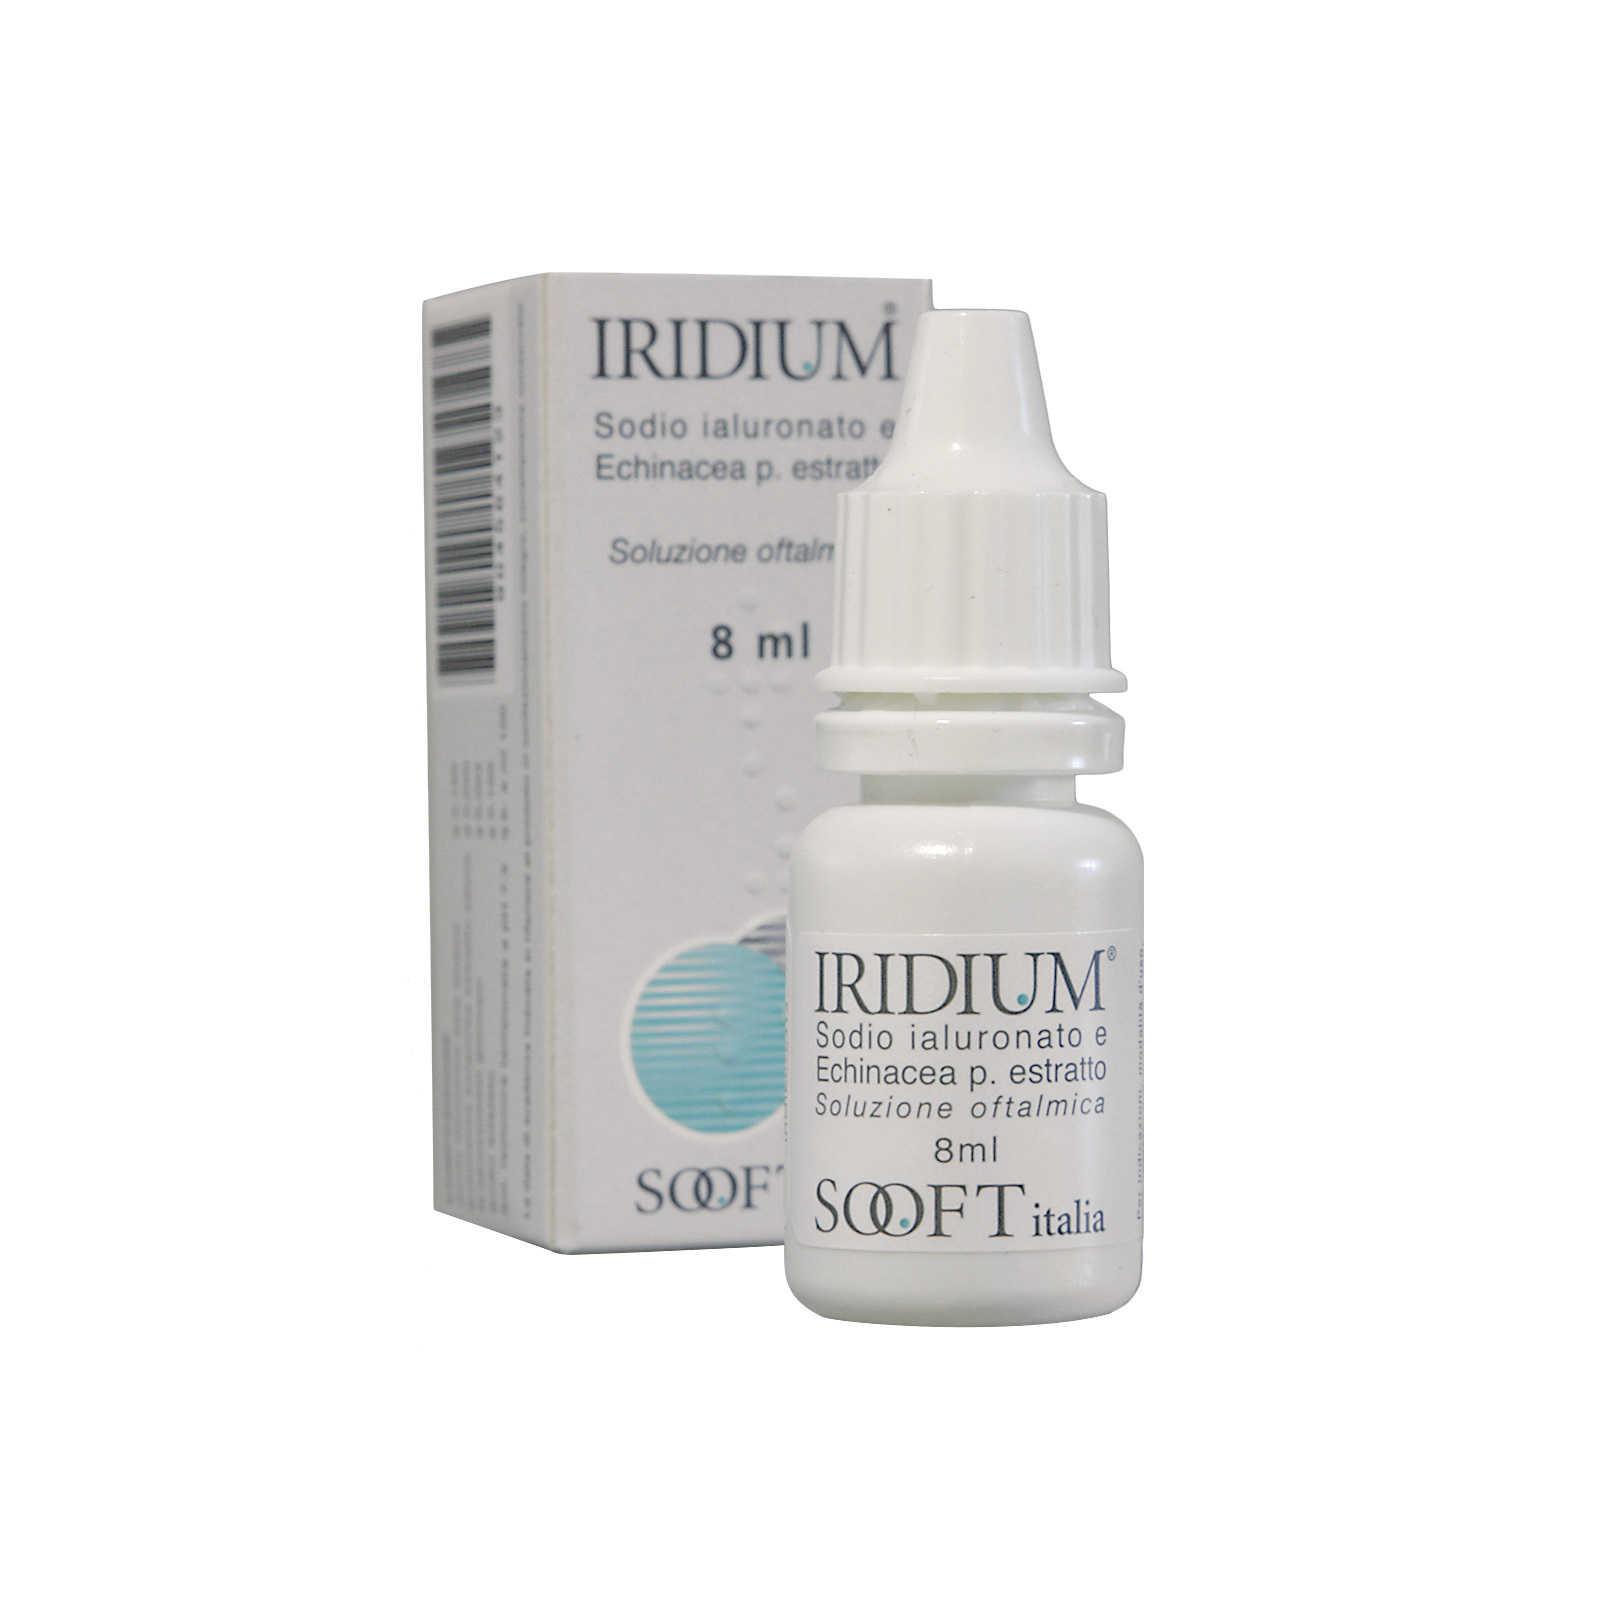 Iridium - Gocce Oculari